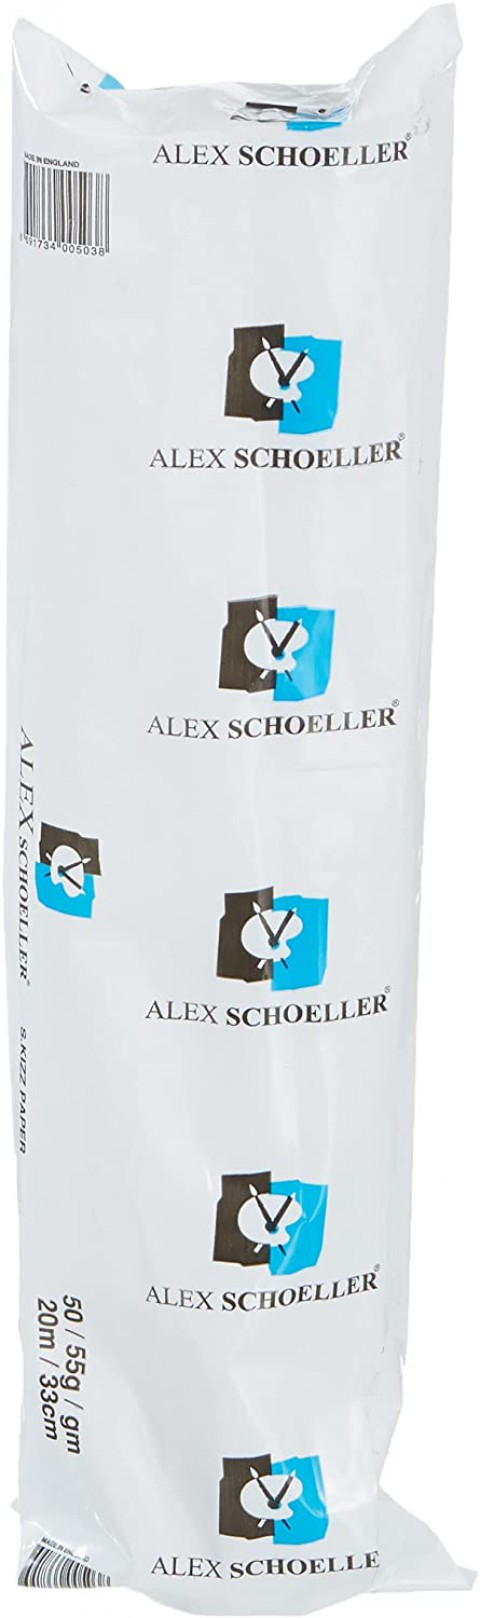 Alex Schoeller 33cm x20 mt Eskiz Aydınger Rulo (50/55 gr/m2)